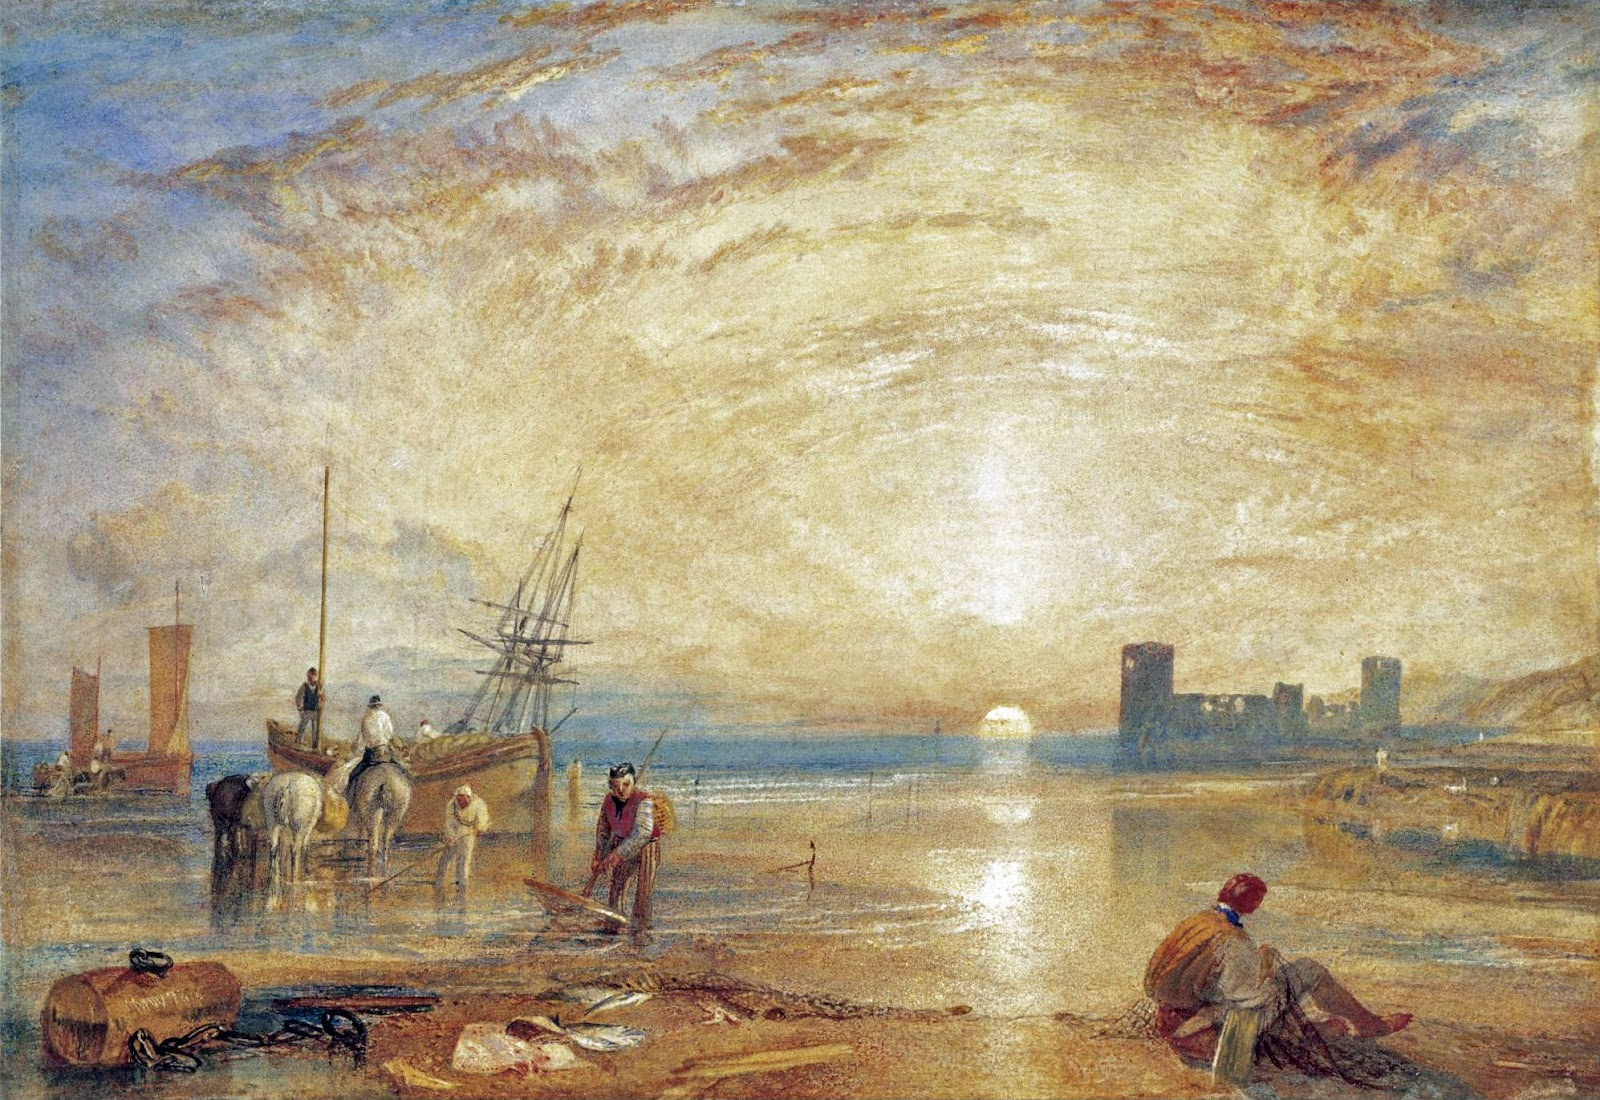 Victorian British Painting: Joseph Mallord William Turner - Castles, ctd